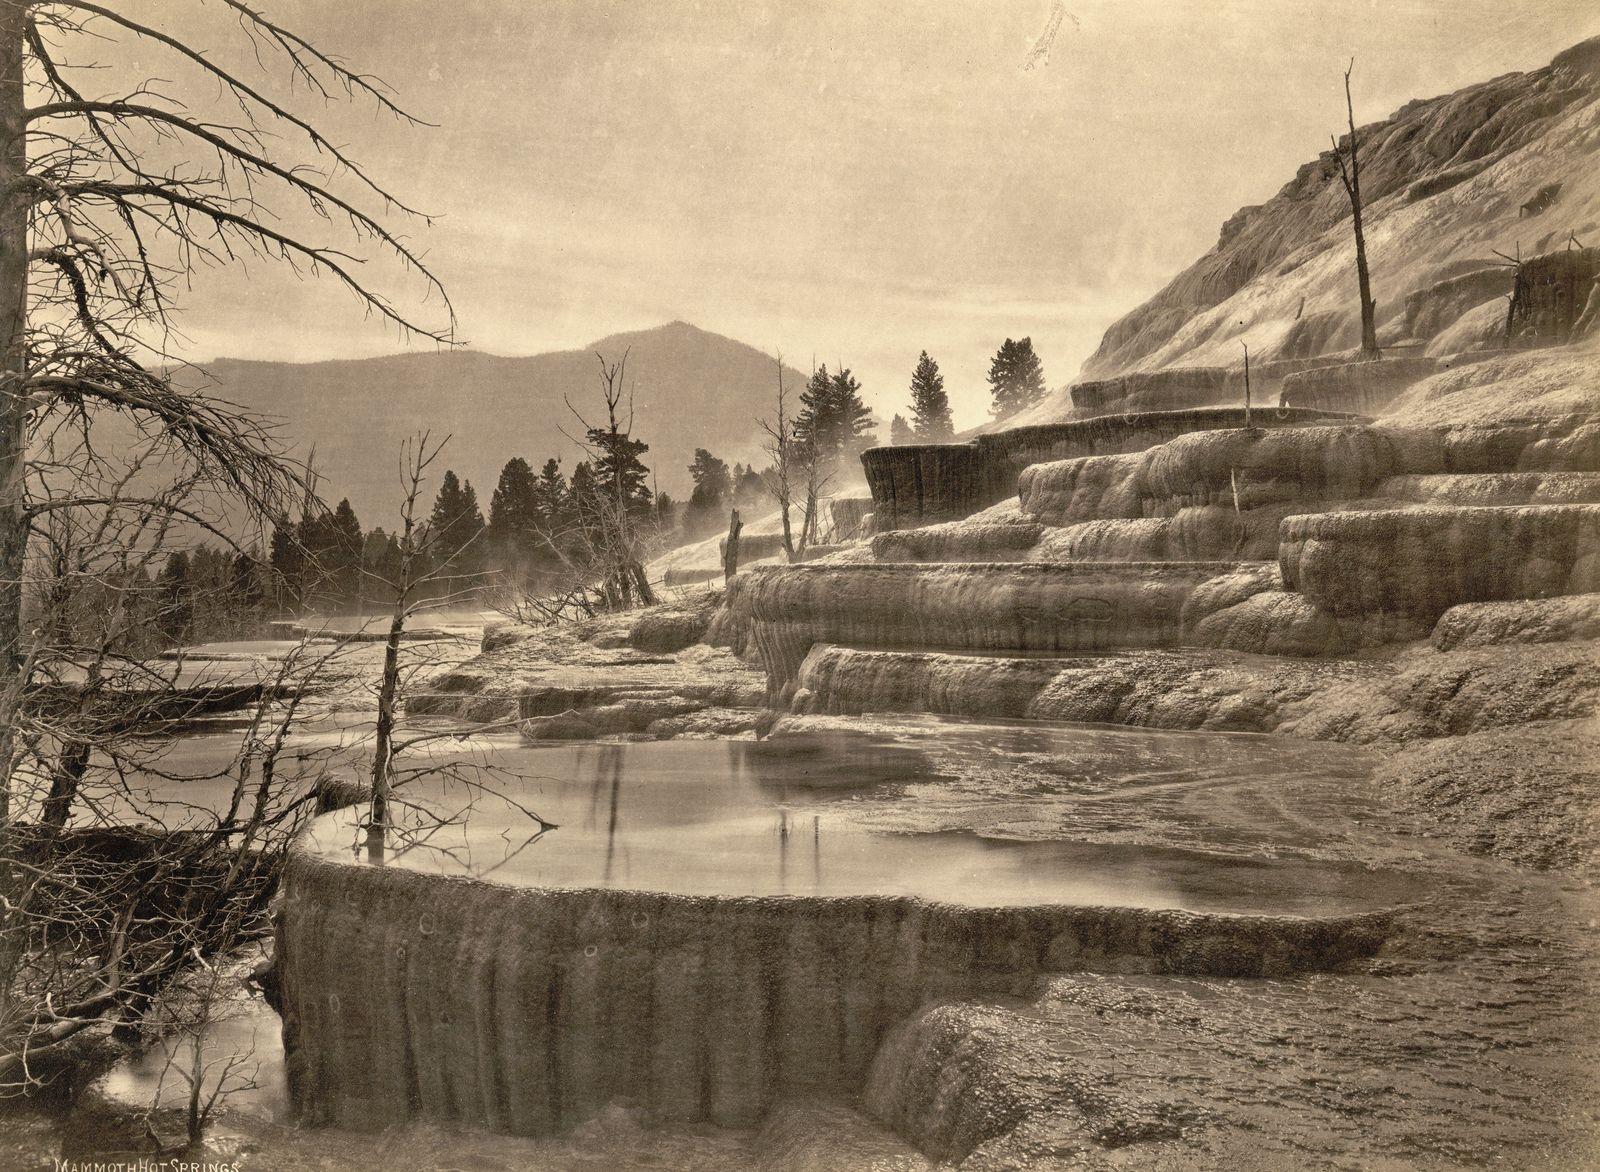 Historische Reisebilder - Mammoth Hot Springs